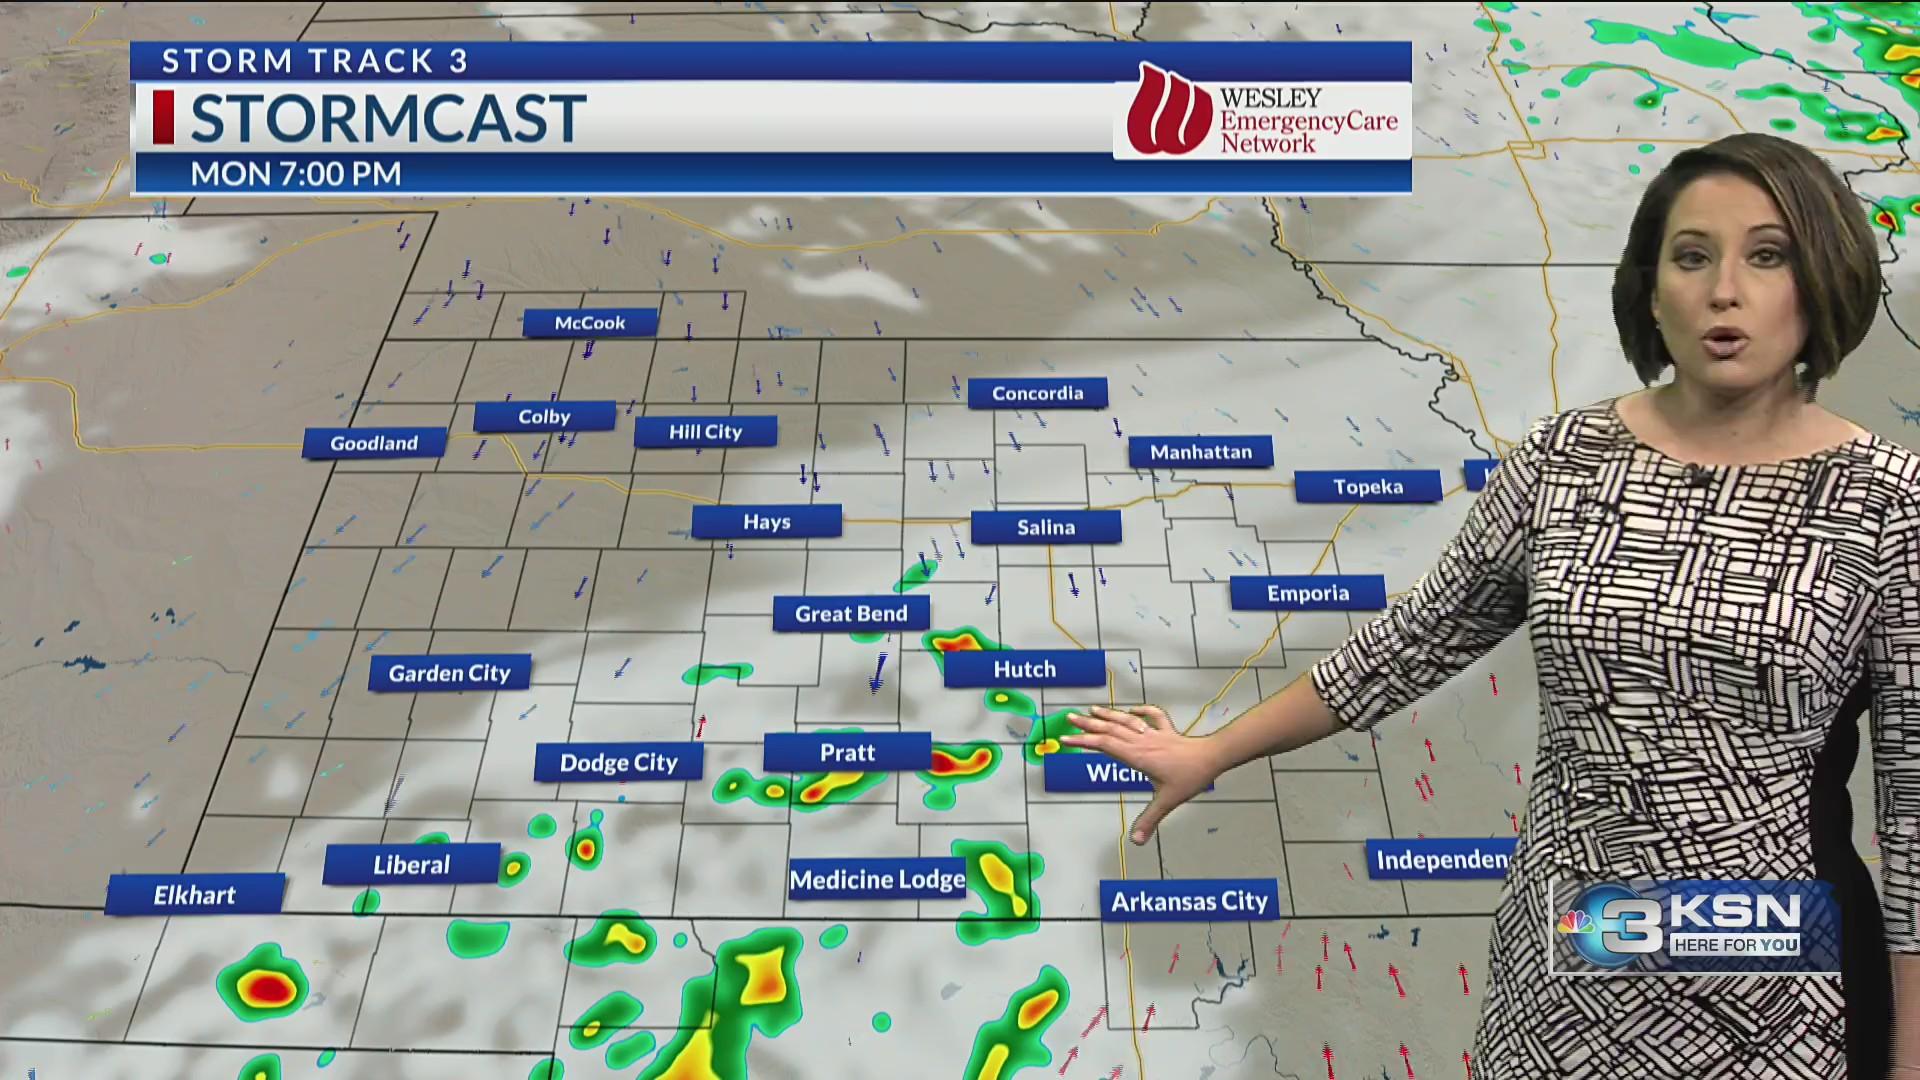 KSN-TV, Kansas News & Weather | Wichita, KS | KSN com